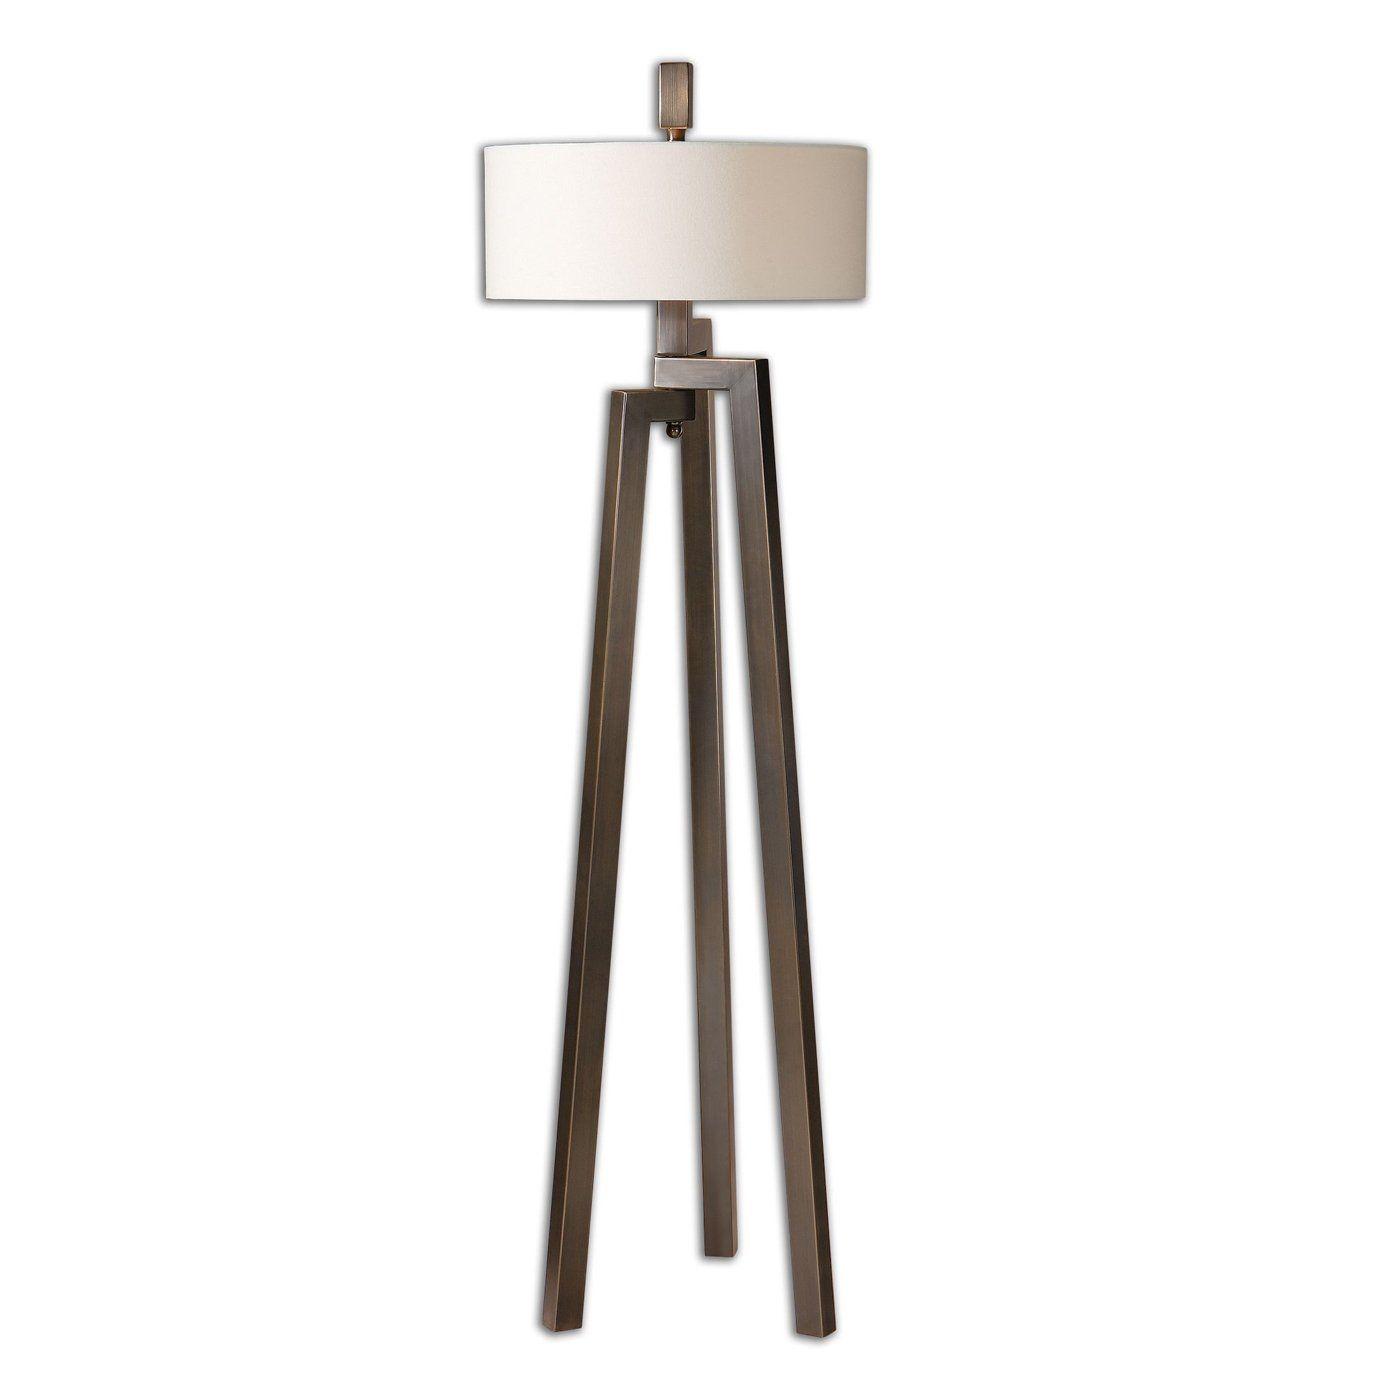 Rewards of an iron floor lamp